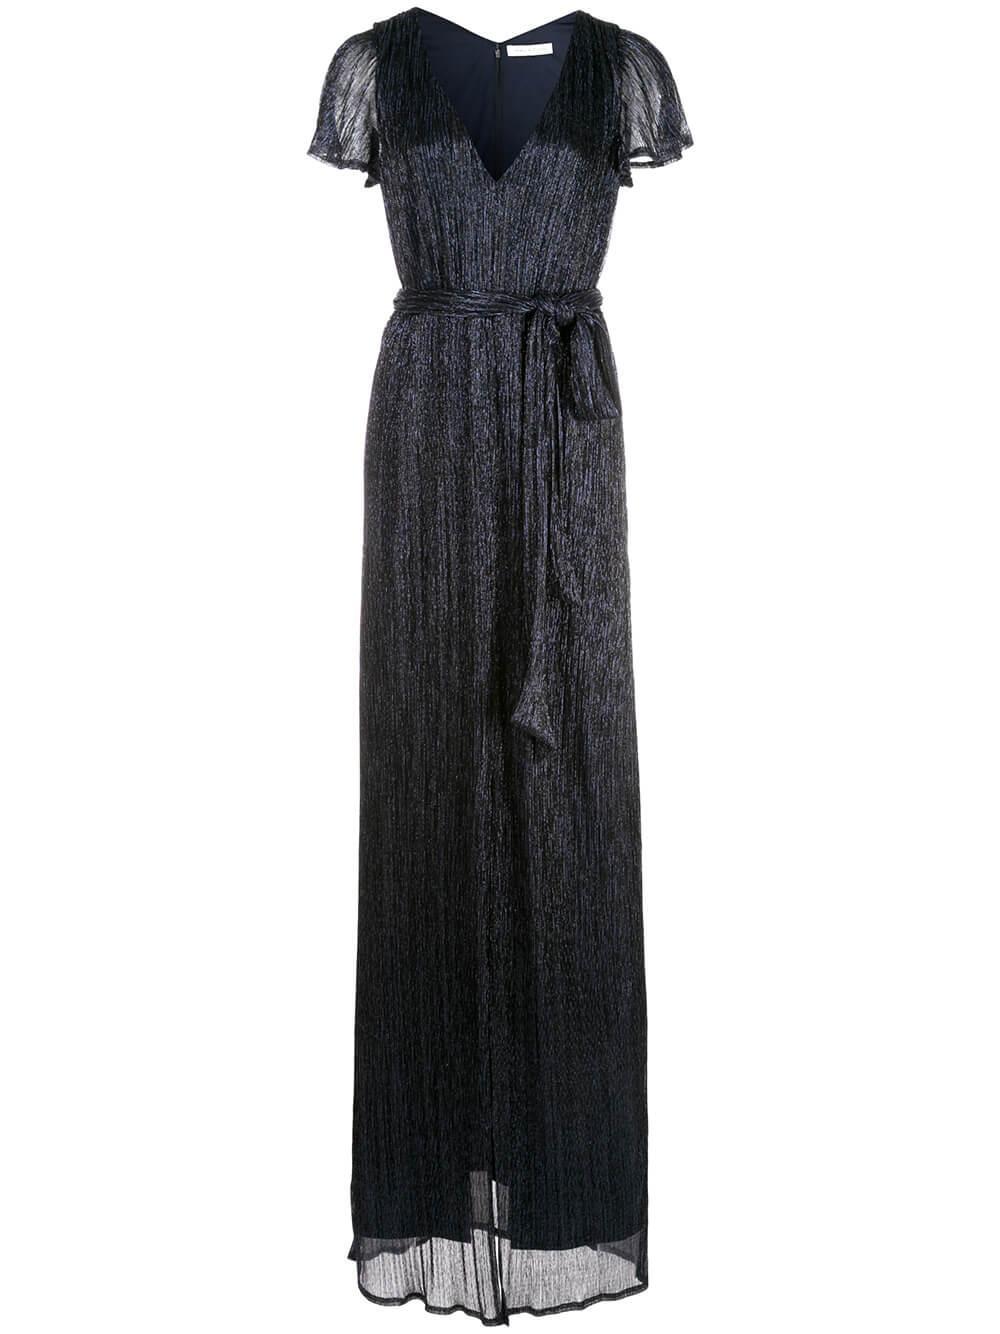 Metallic Jersey Gown Item # 1012256